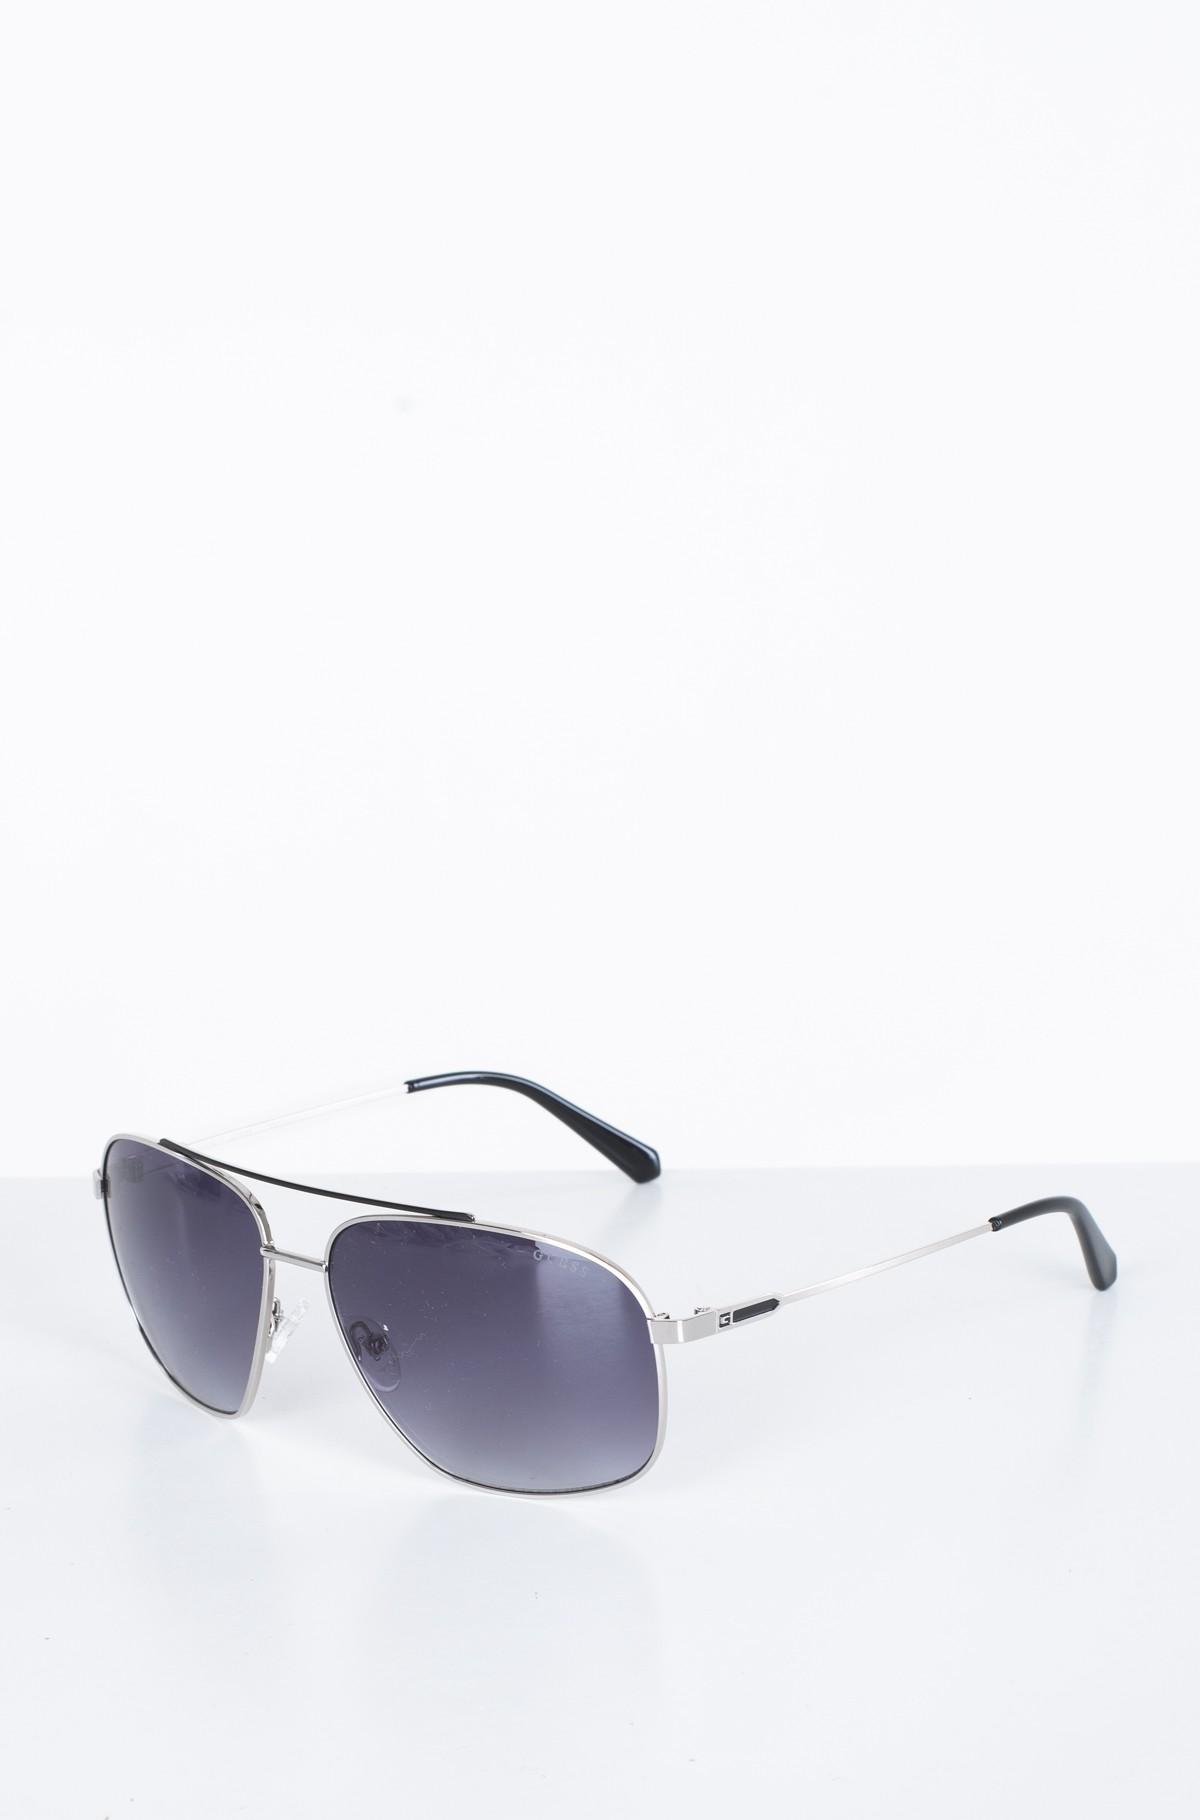 Sunglasses 6973-full-2